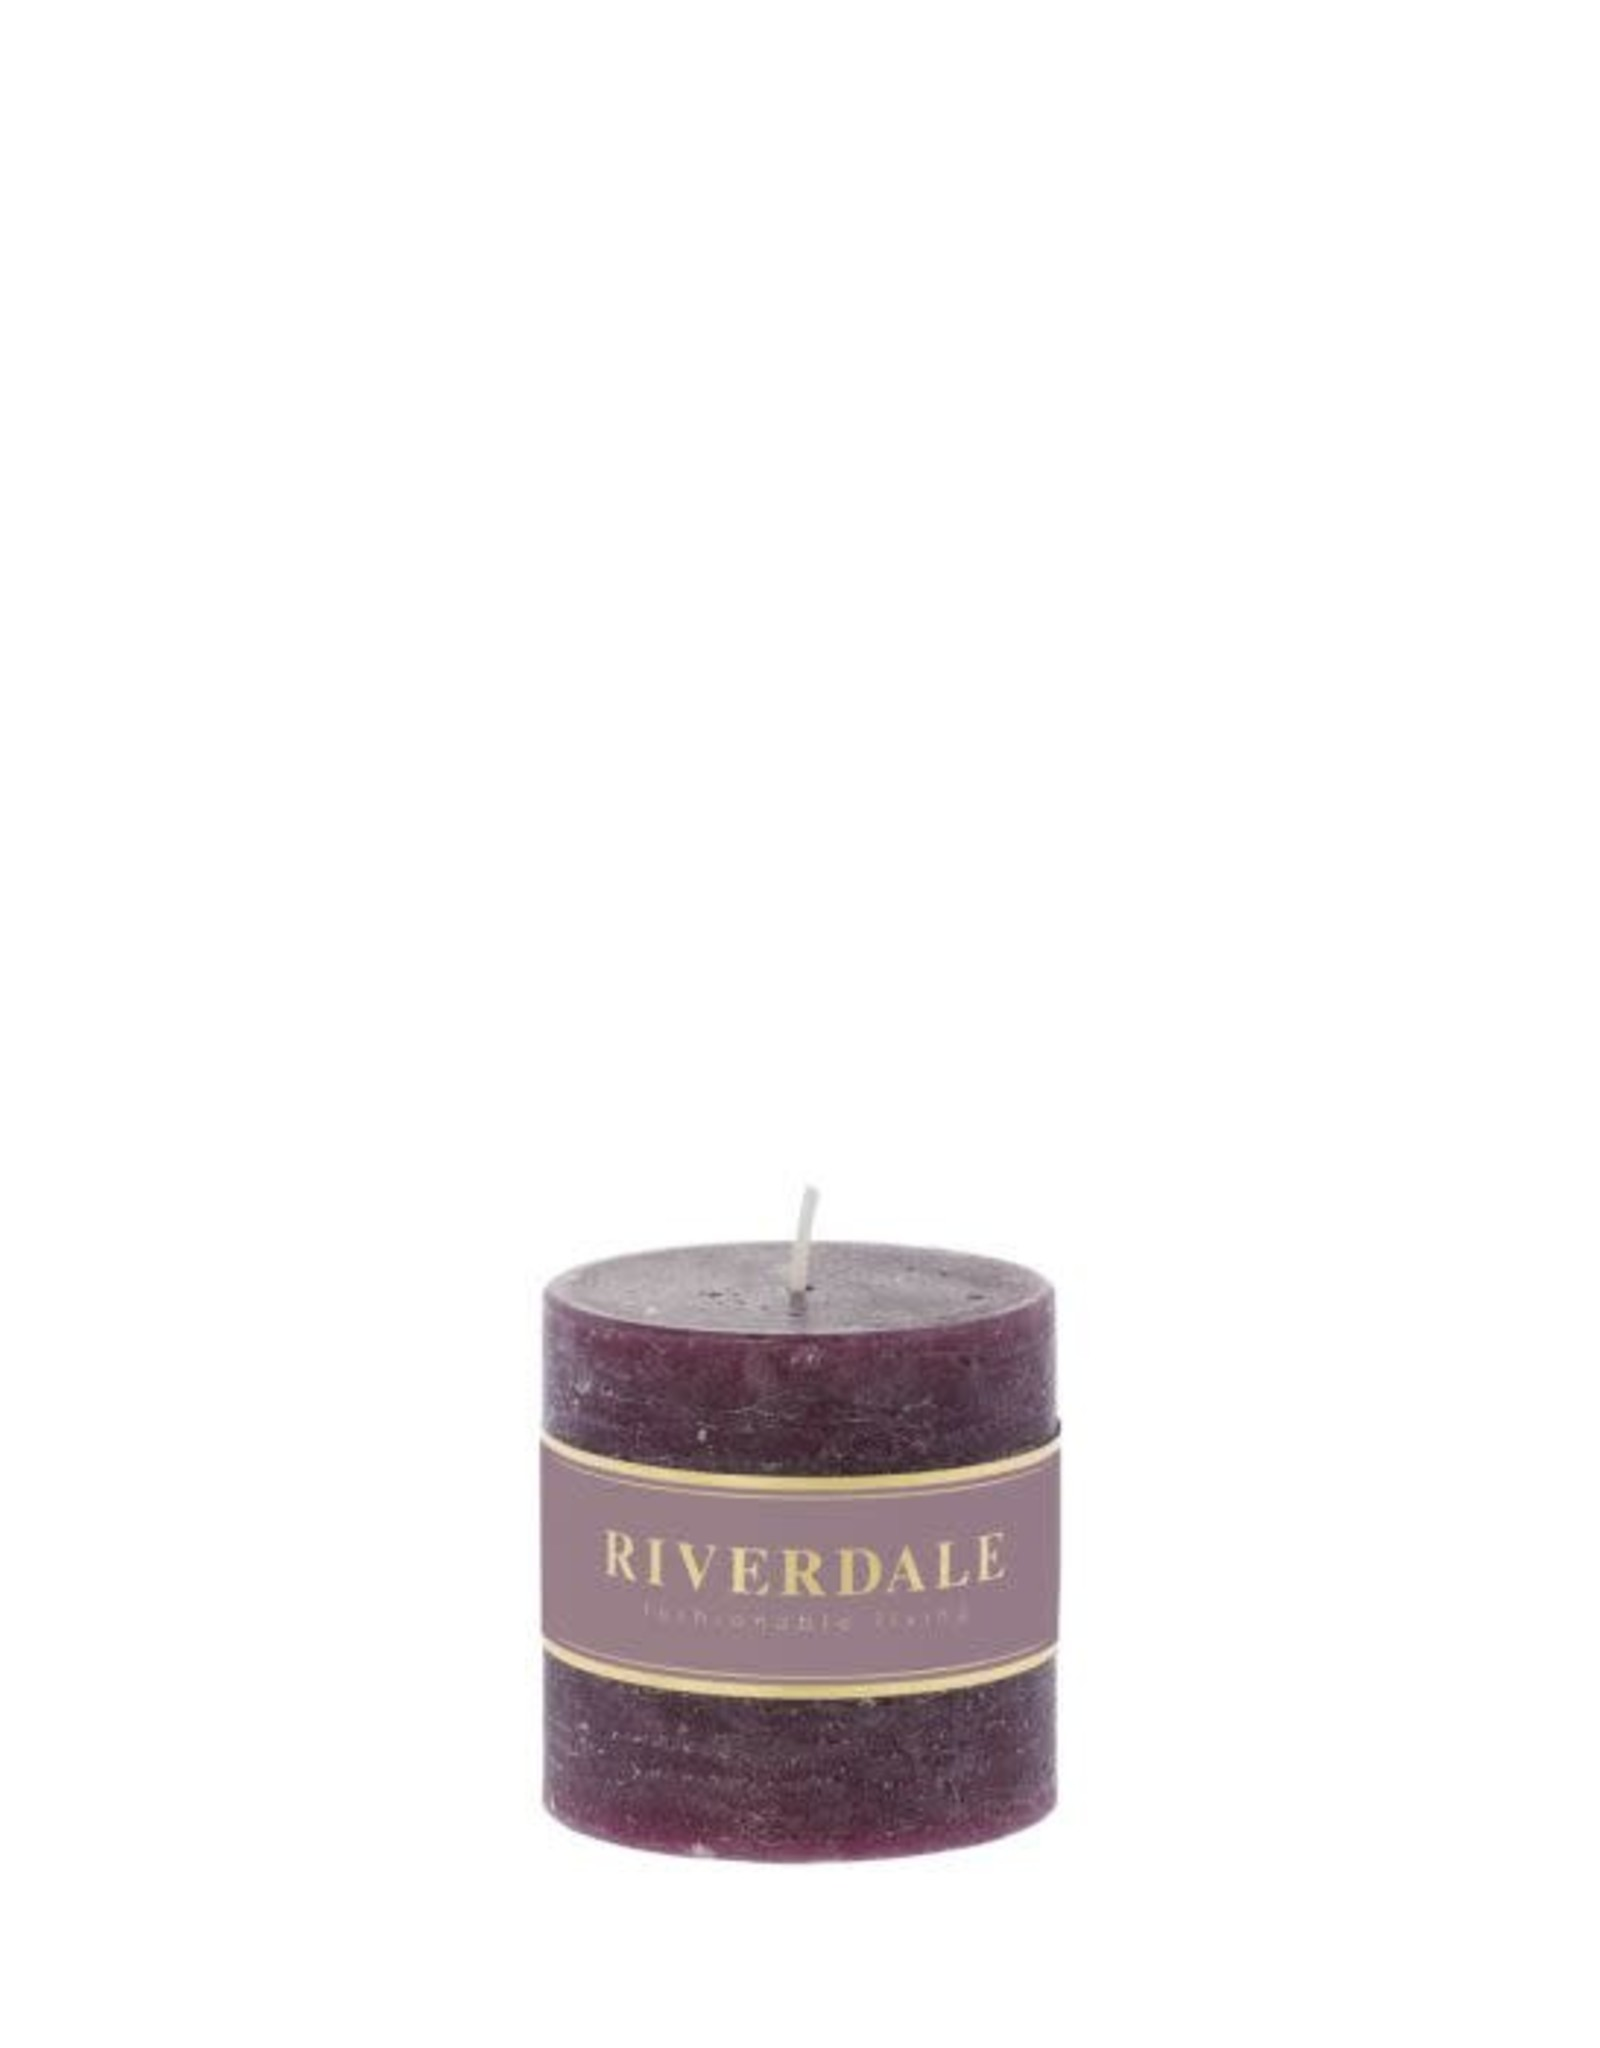 Riverdale Geurkaars Pillar dark burg 7.5x7.5c